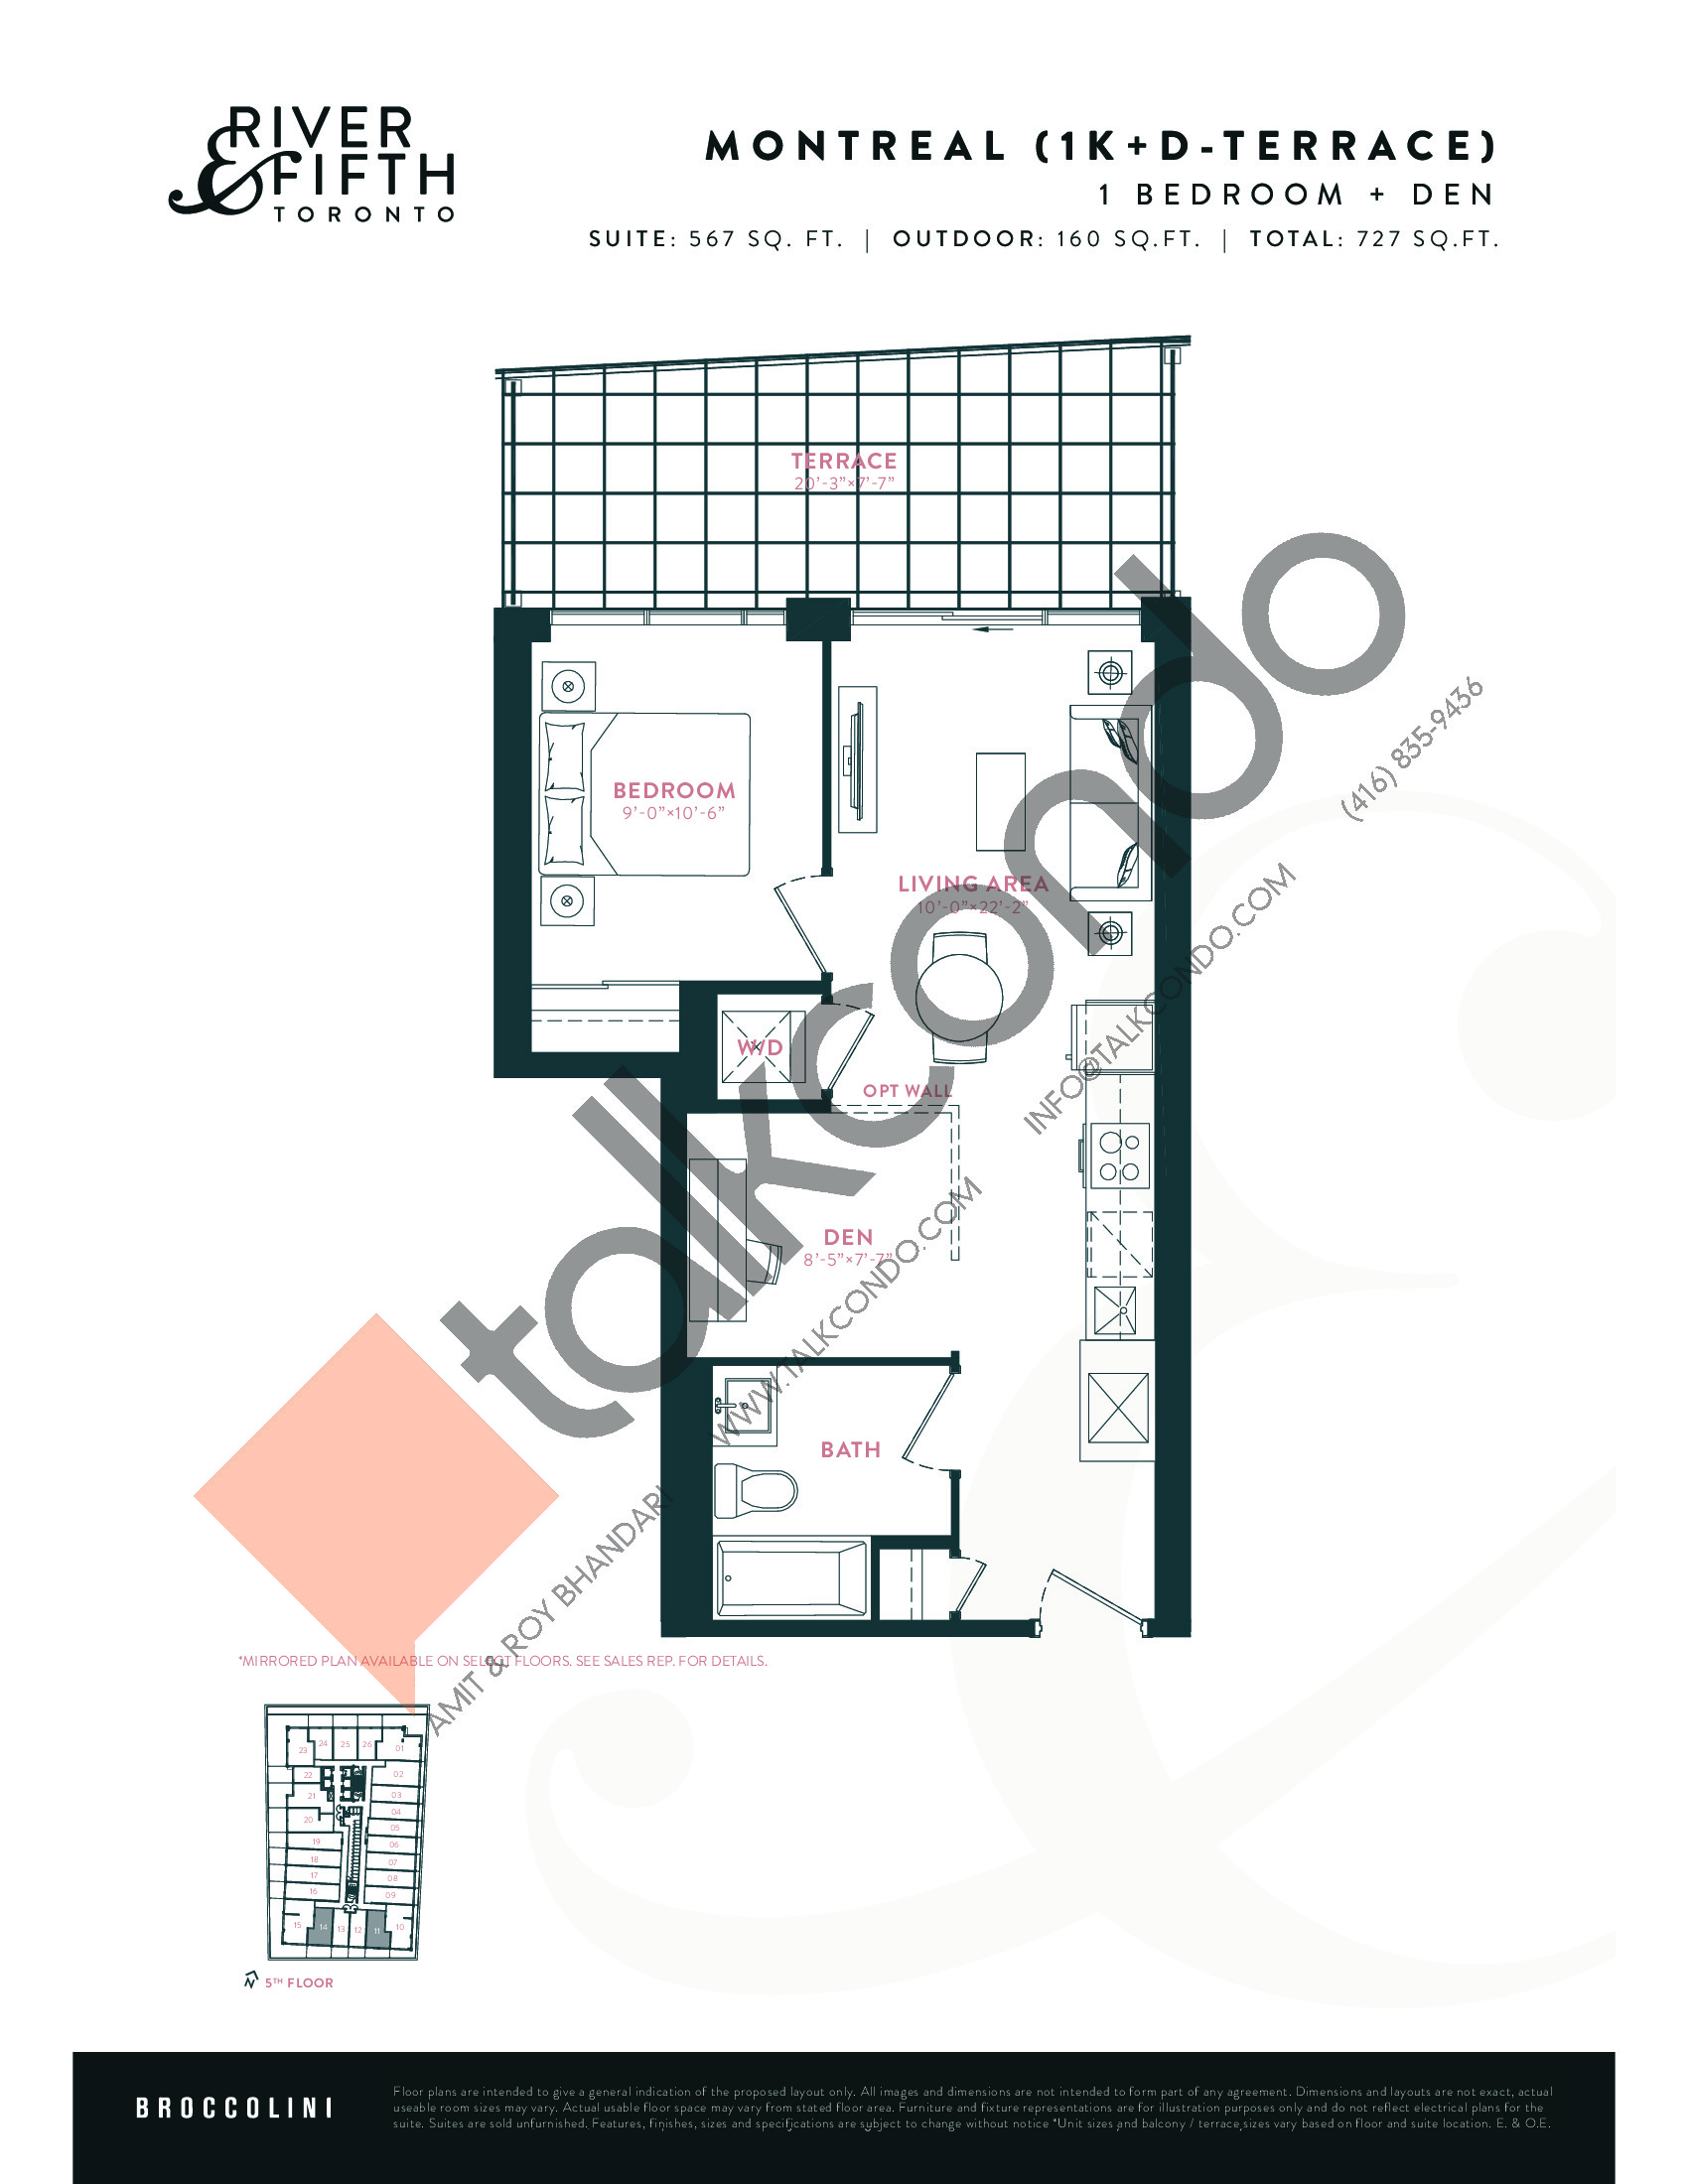 Montreal (1K+D-Terrace) Floor Plan at River & Fifth Condos - 567 sq.ft